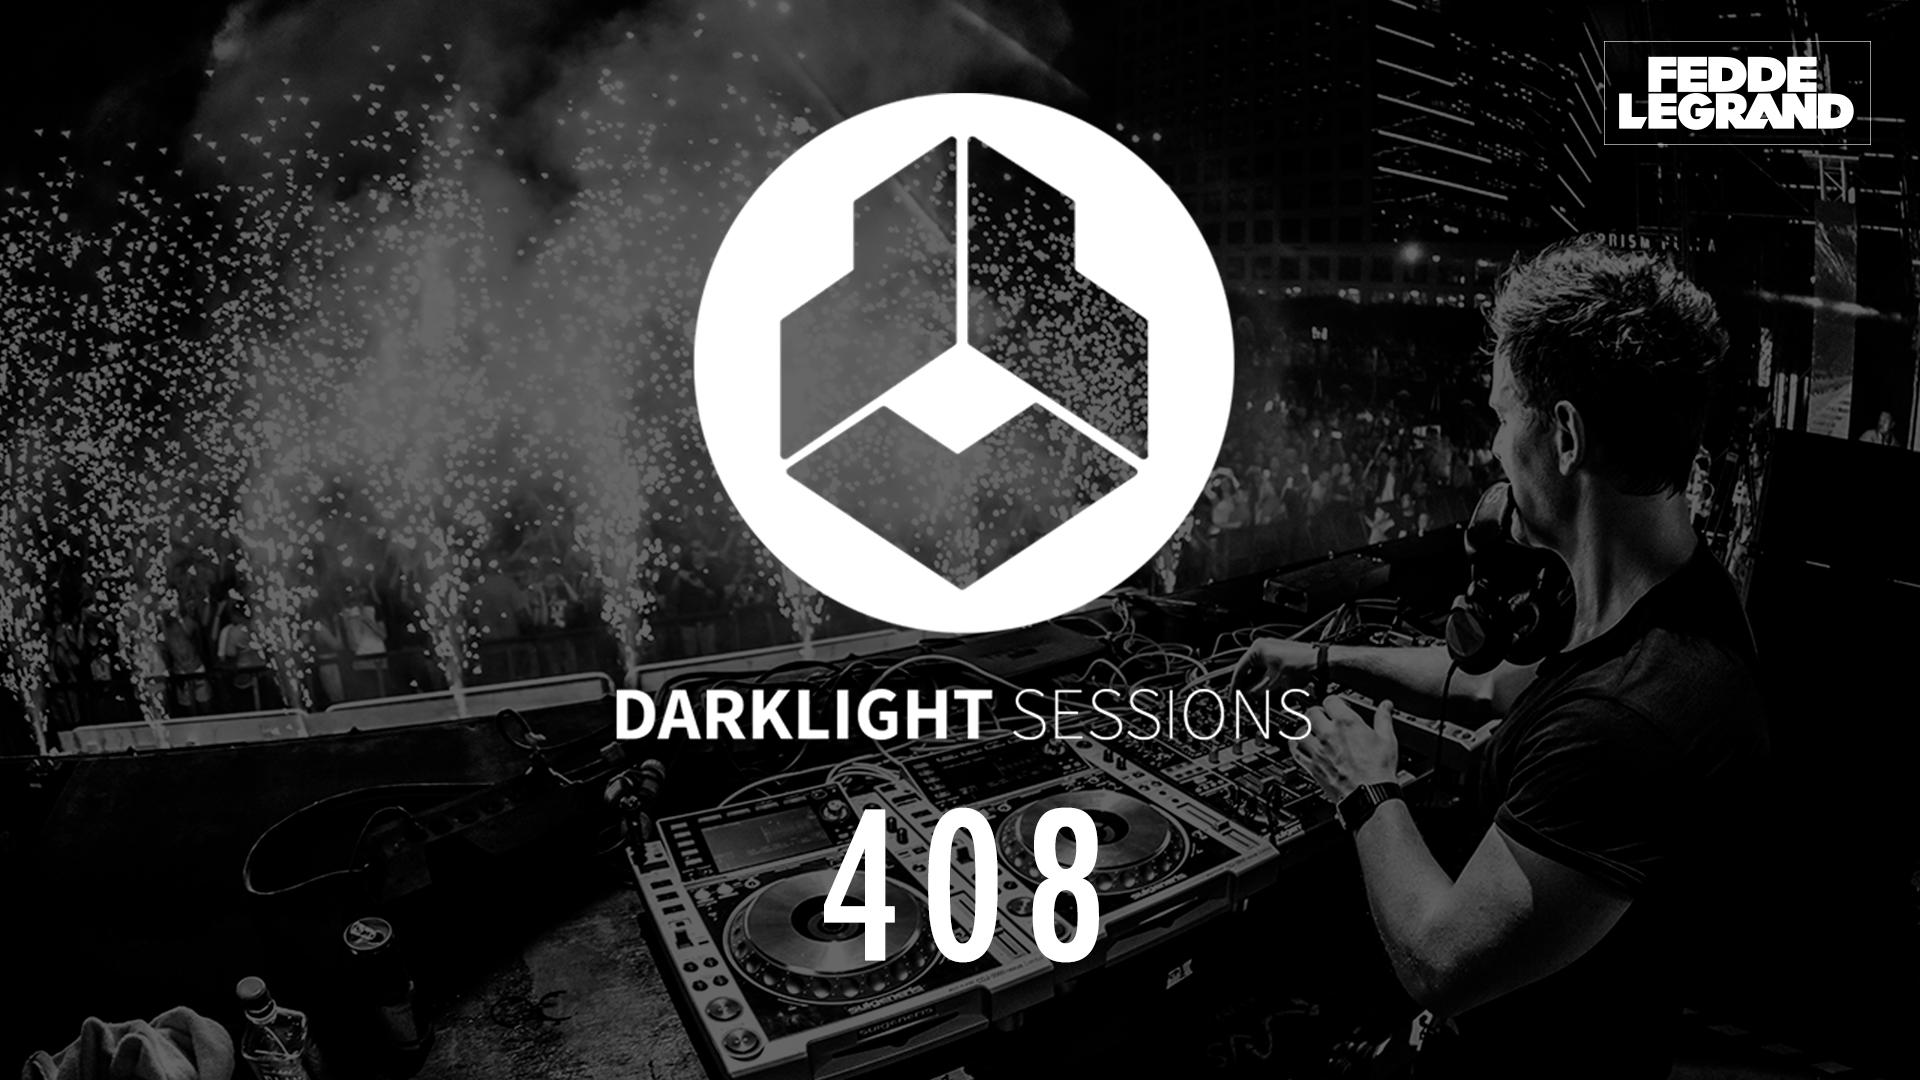 Darklight Sessions 408